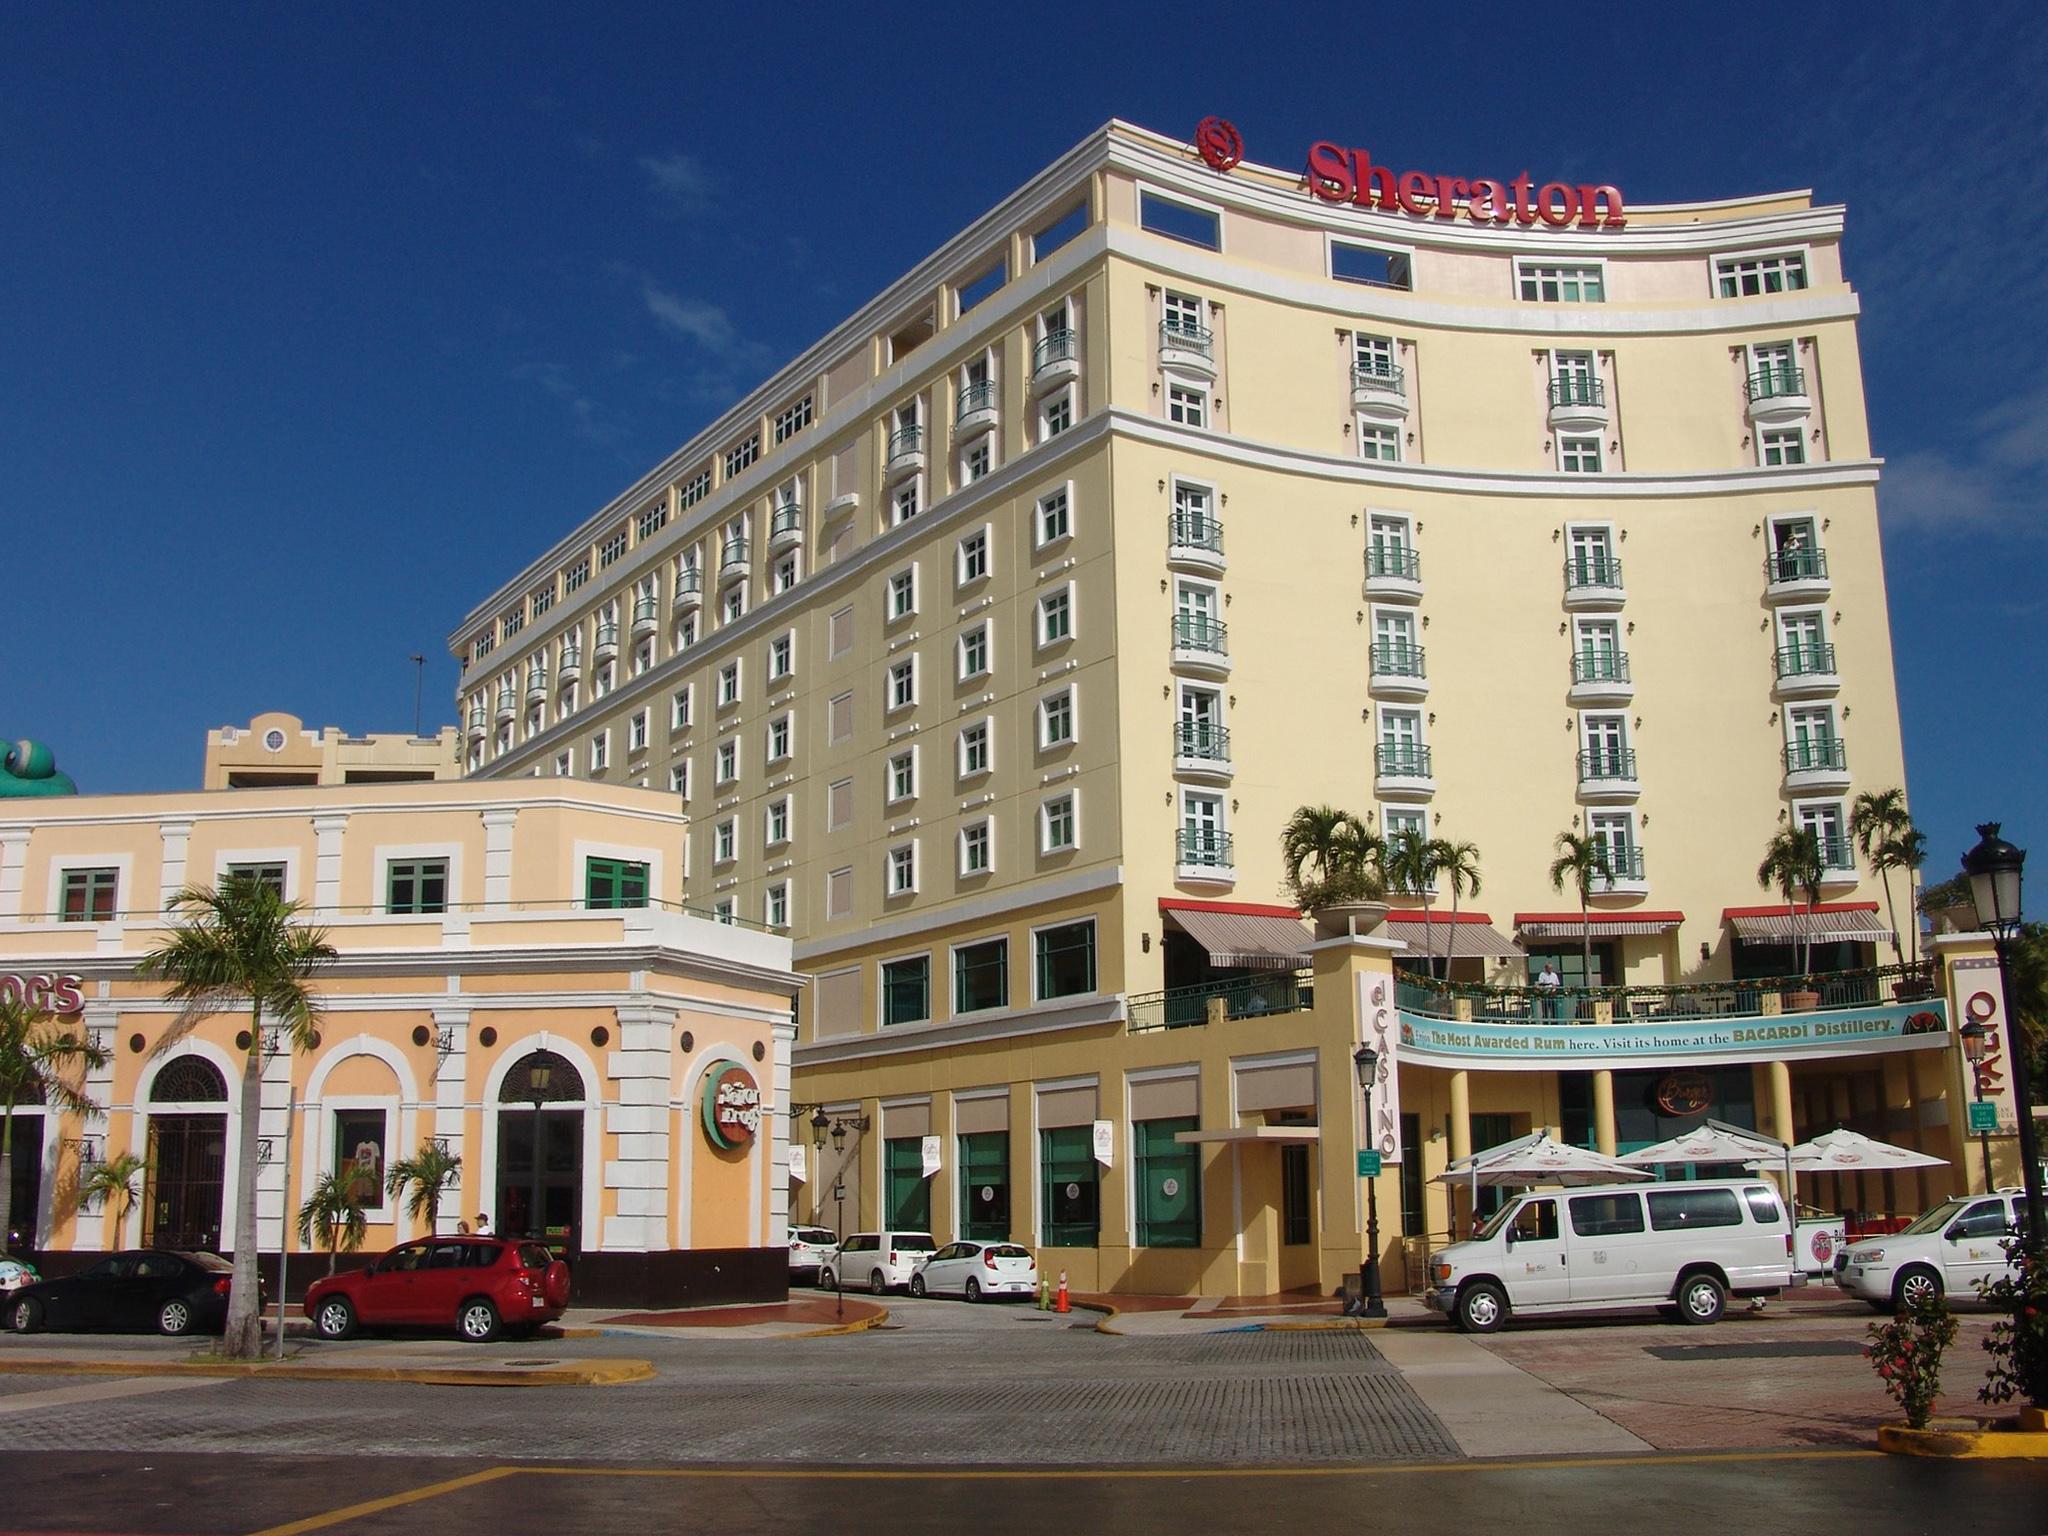 old san juan casino hotel